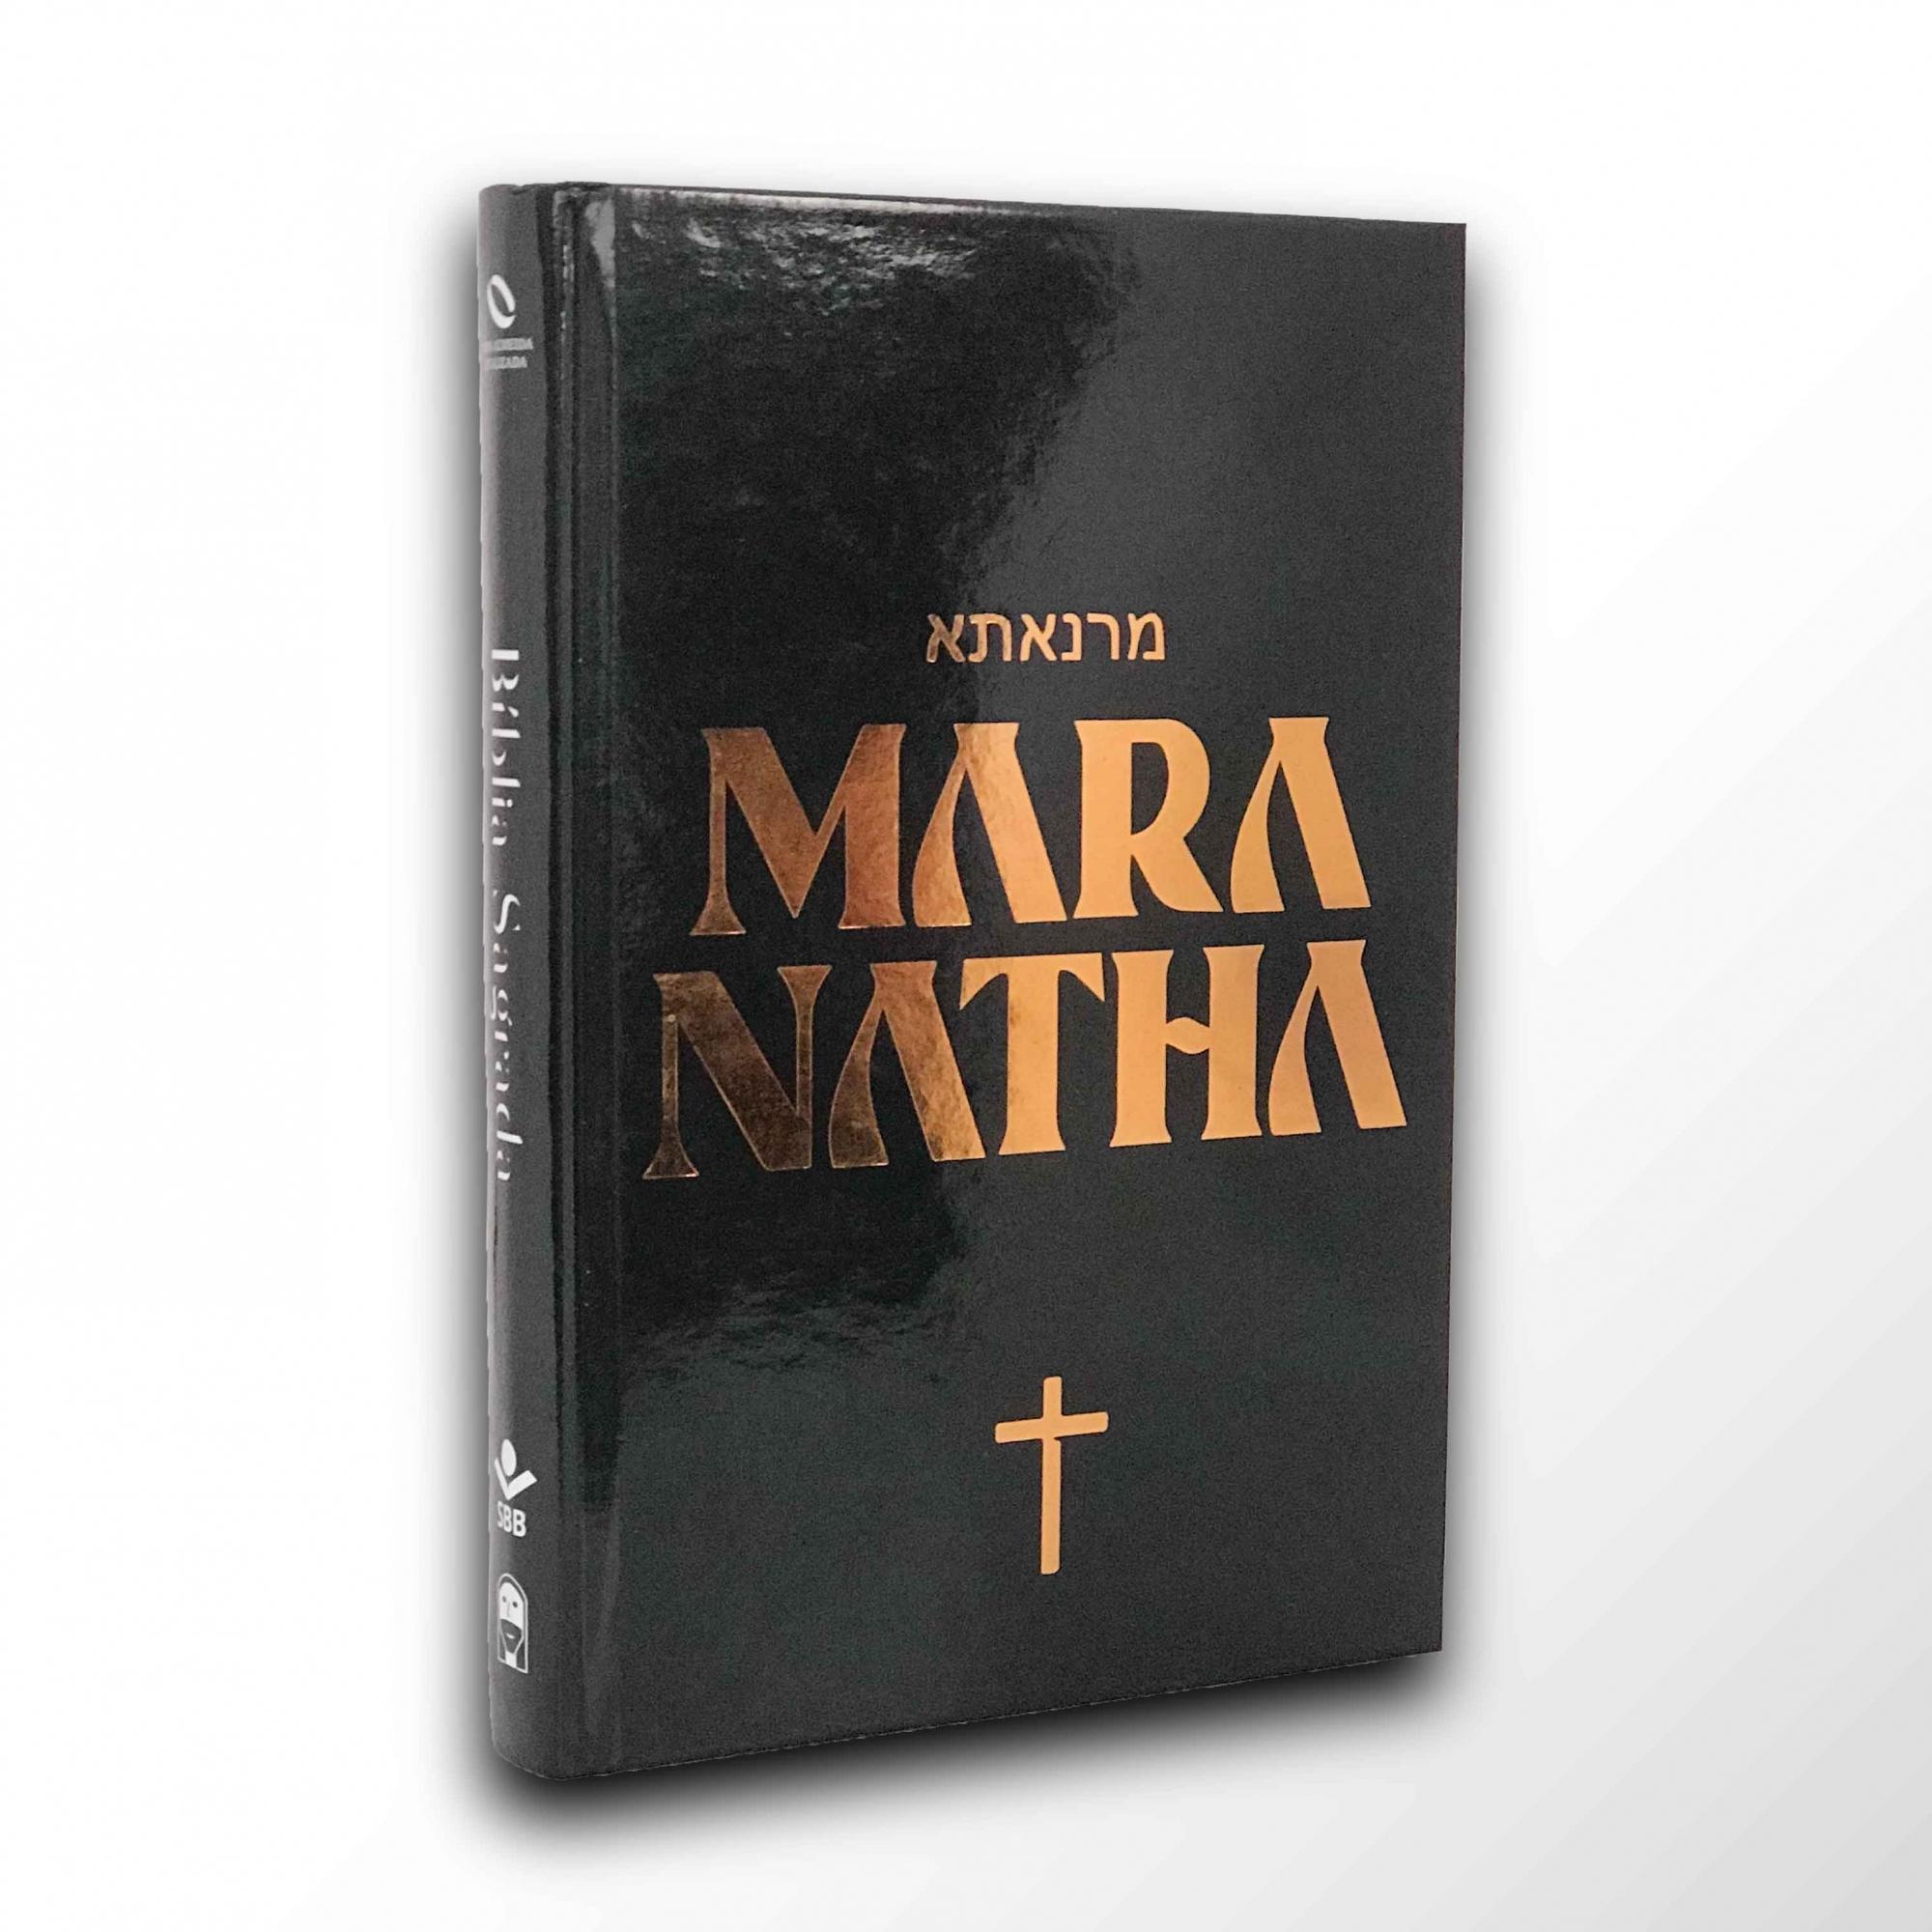 Bíblia Maranatha (Maranata) - NAA  - Loja JesusCopy